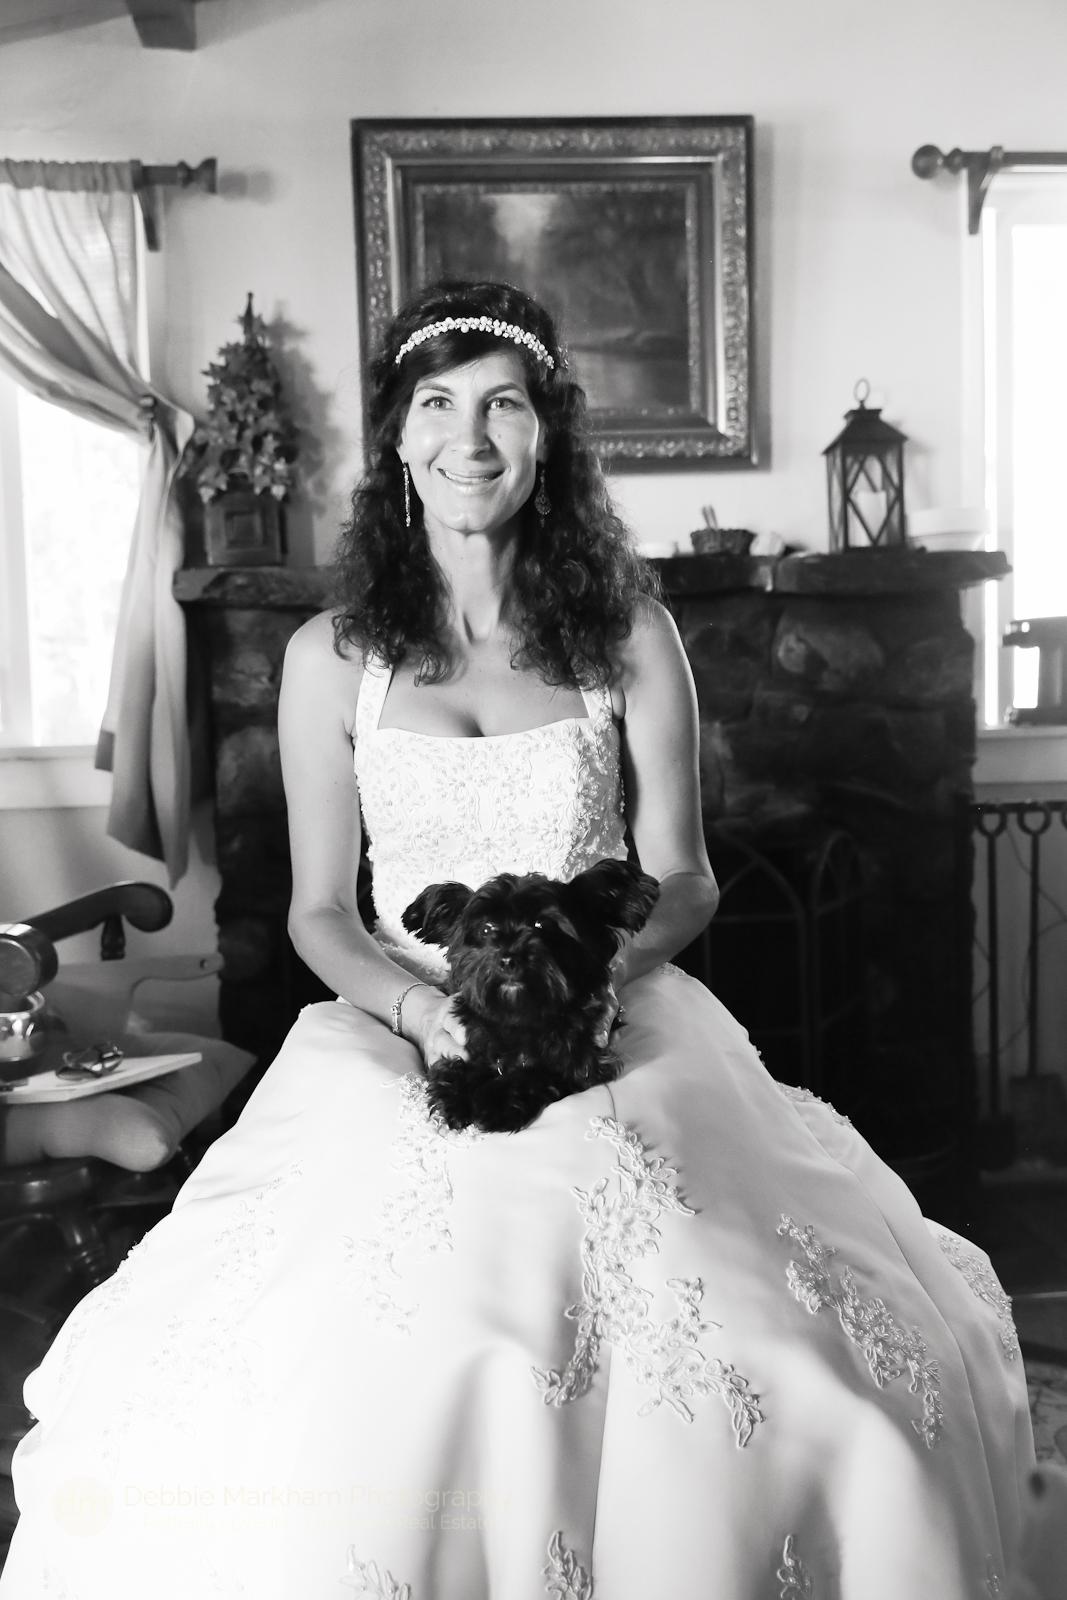 destination-wedding_small-wedding_big-sur_california-coast_ocean-view_gorda_wedding-photographer_debbie-markham-4643